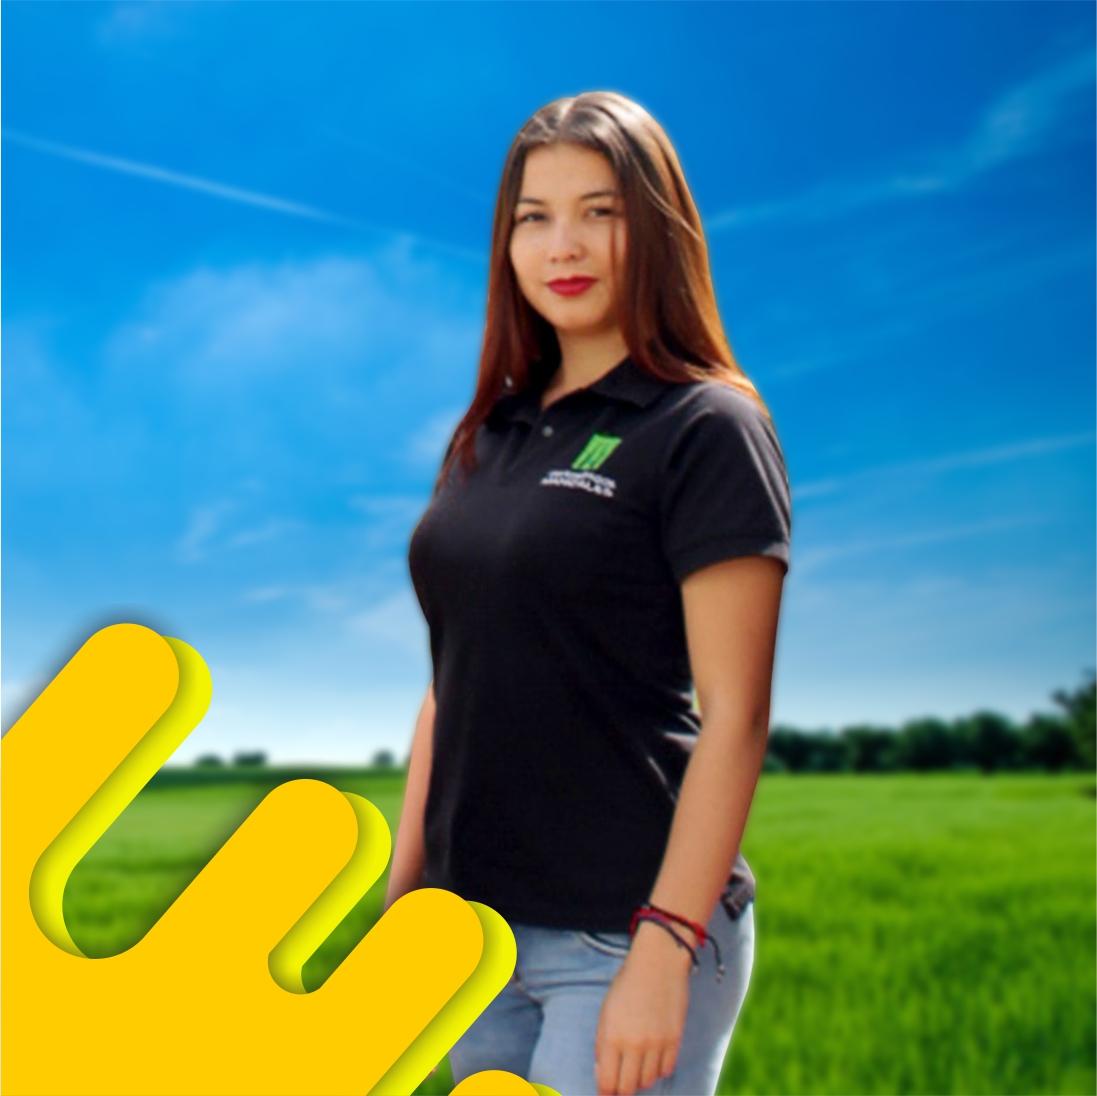 Técnica Profesional en Gestión Comercial del Sector Agropecuario